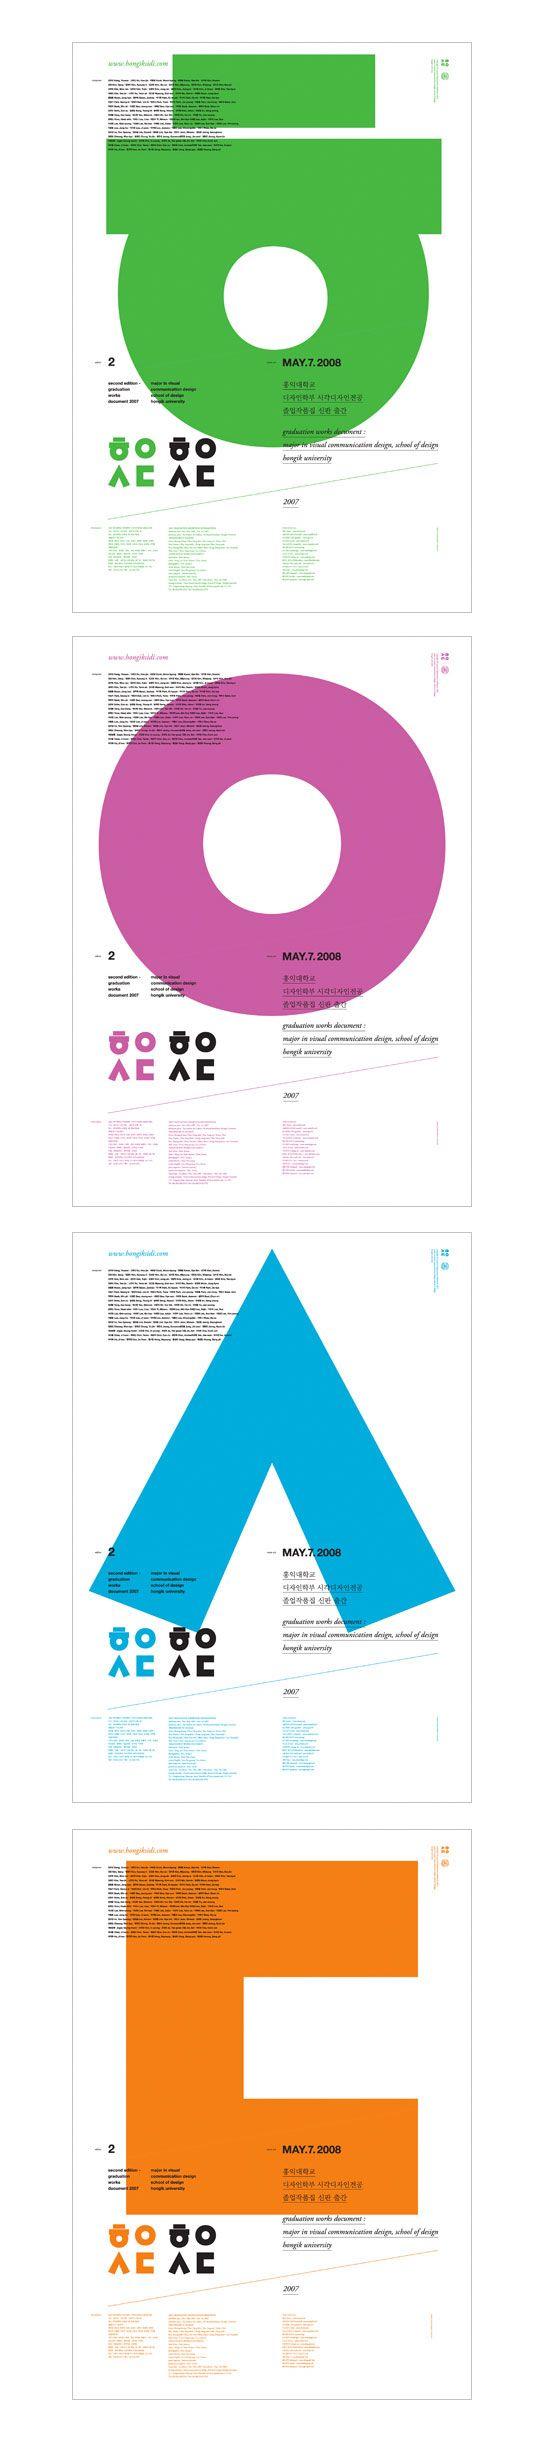 Korean Typography By korean graphic designer